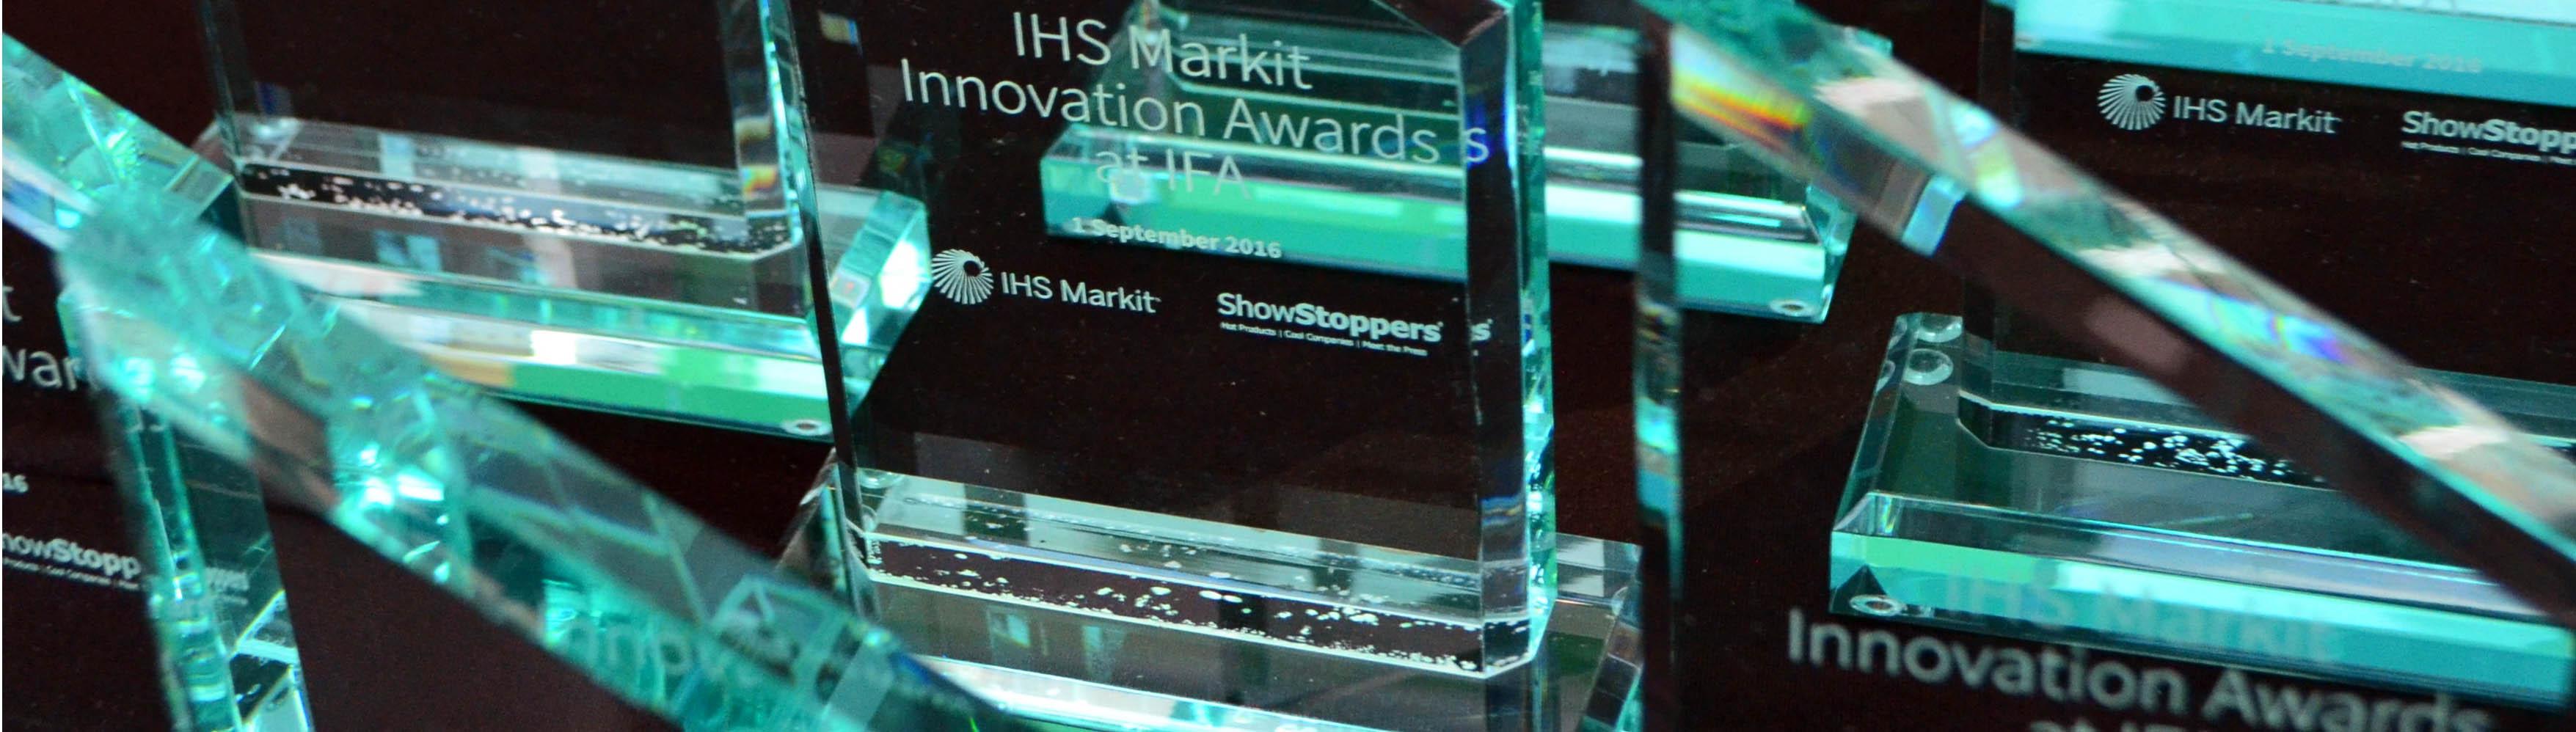 IHS Markit Innovation Awards - CES